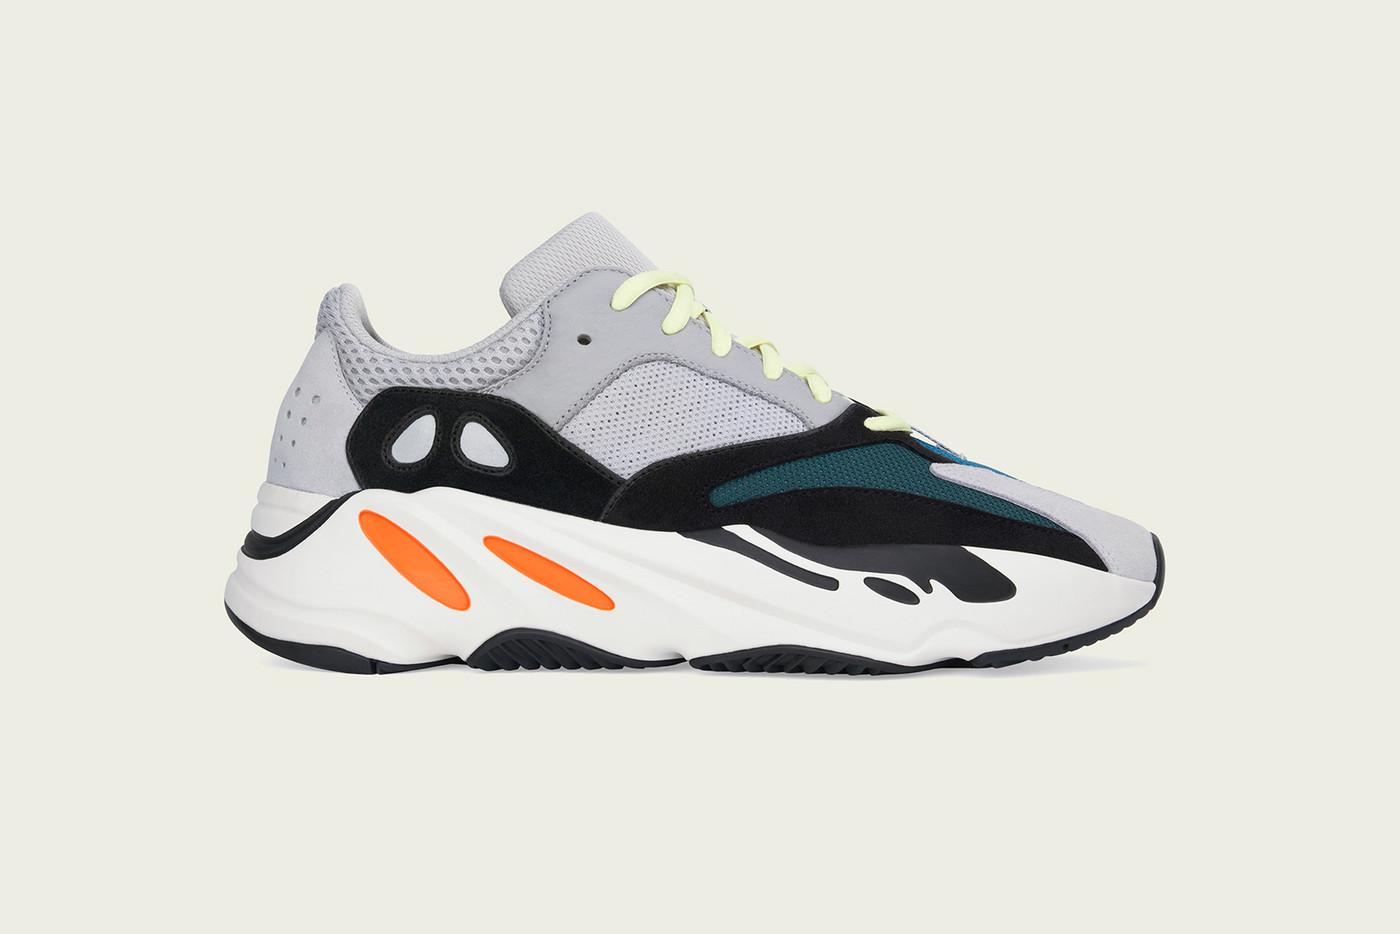 adidas-announces-yeezy-boost-700-restock-1